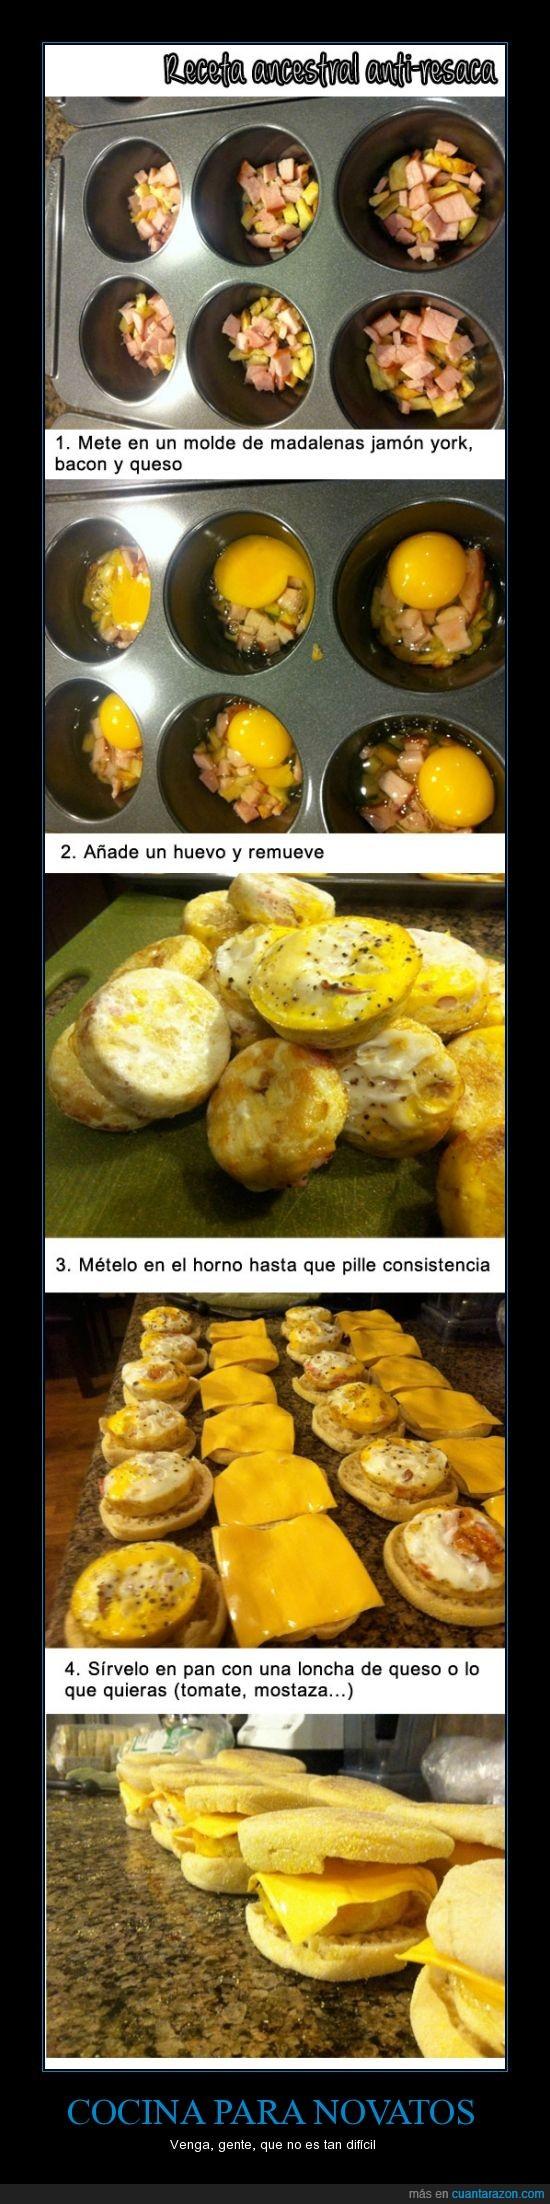 ancestral,bocadillo,comer,horno,huevo,madalena,molde,queso,receta,resaca